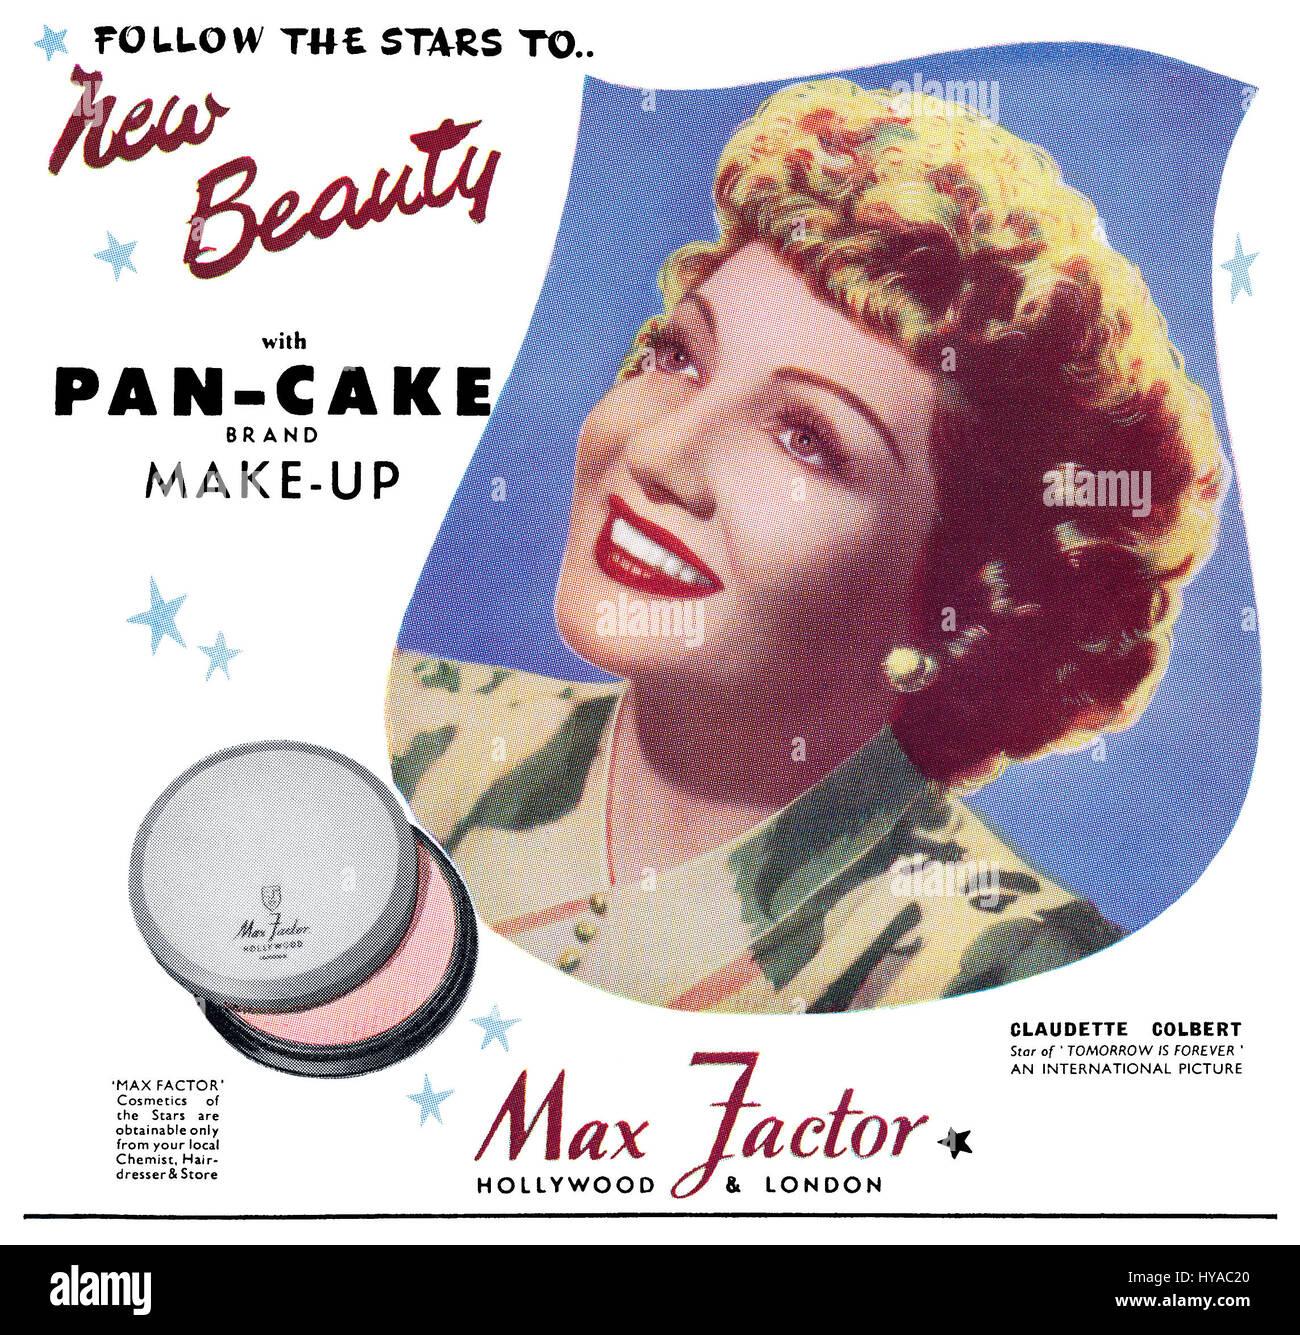 1946 British advertisement for Max Factor Pan-Cake Make-Up ...